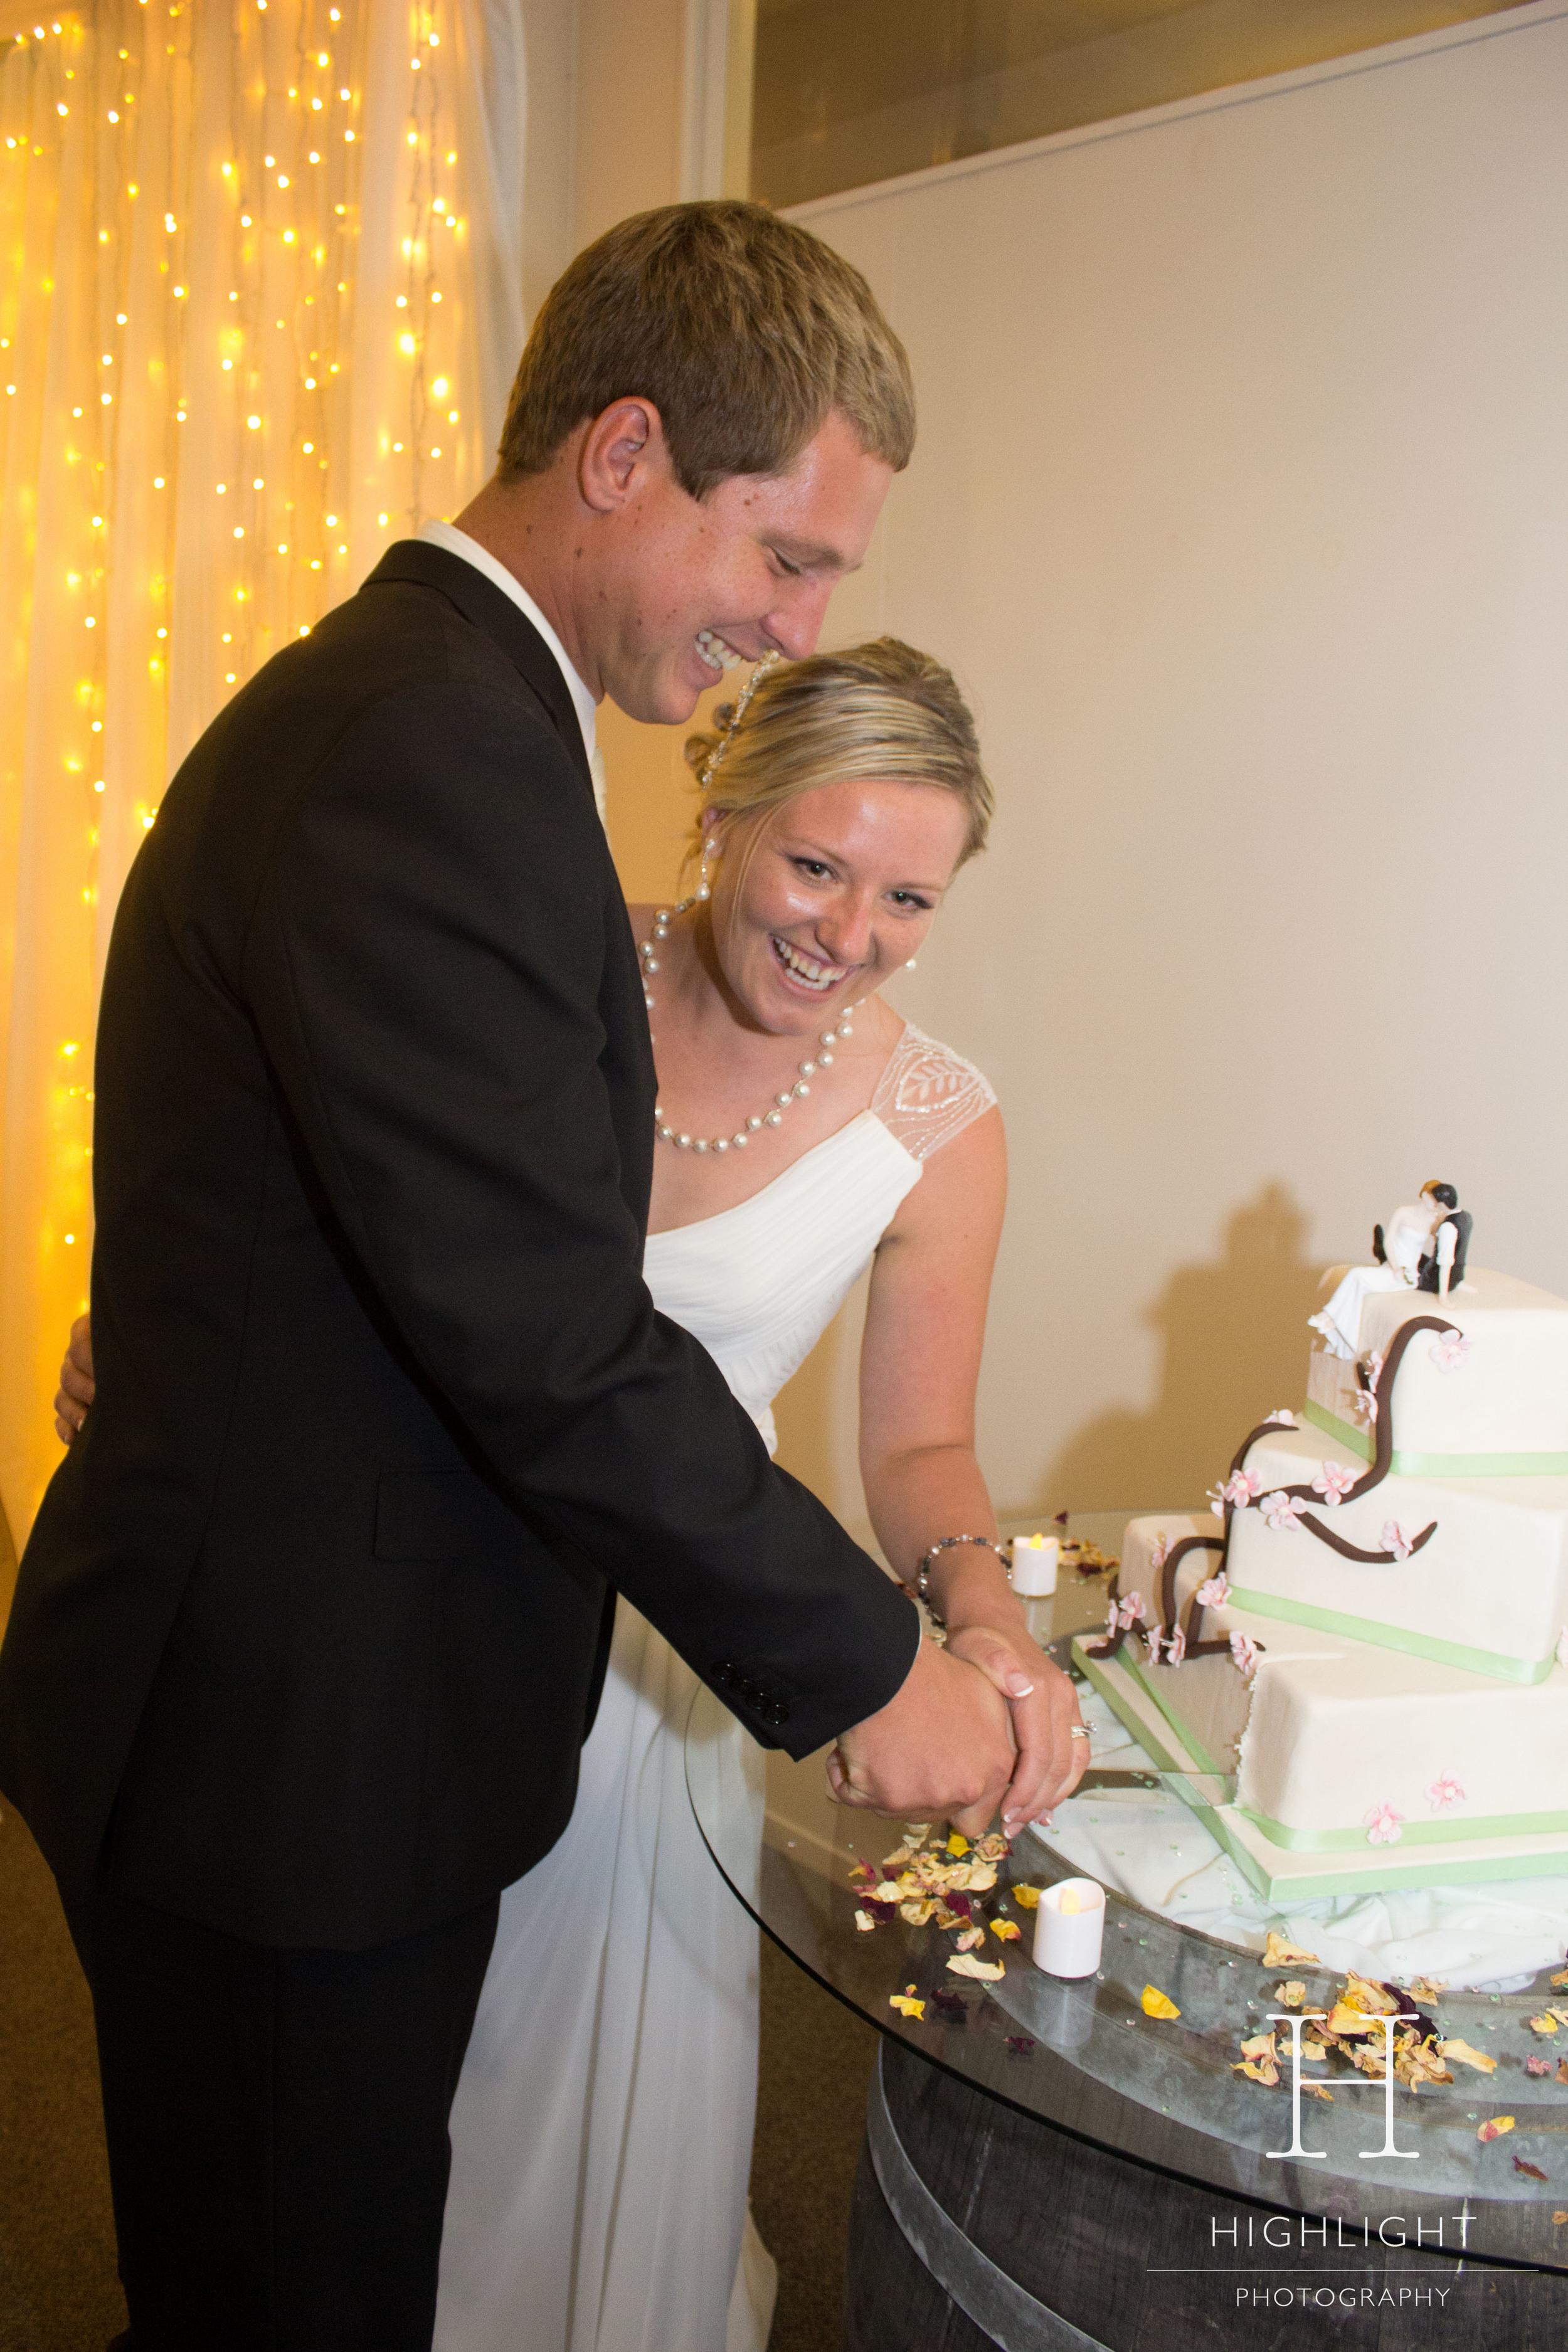 highlight-cake-sm.jpg